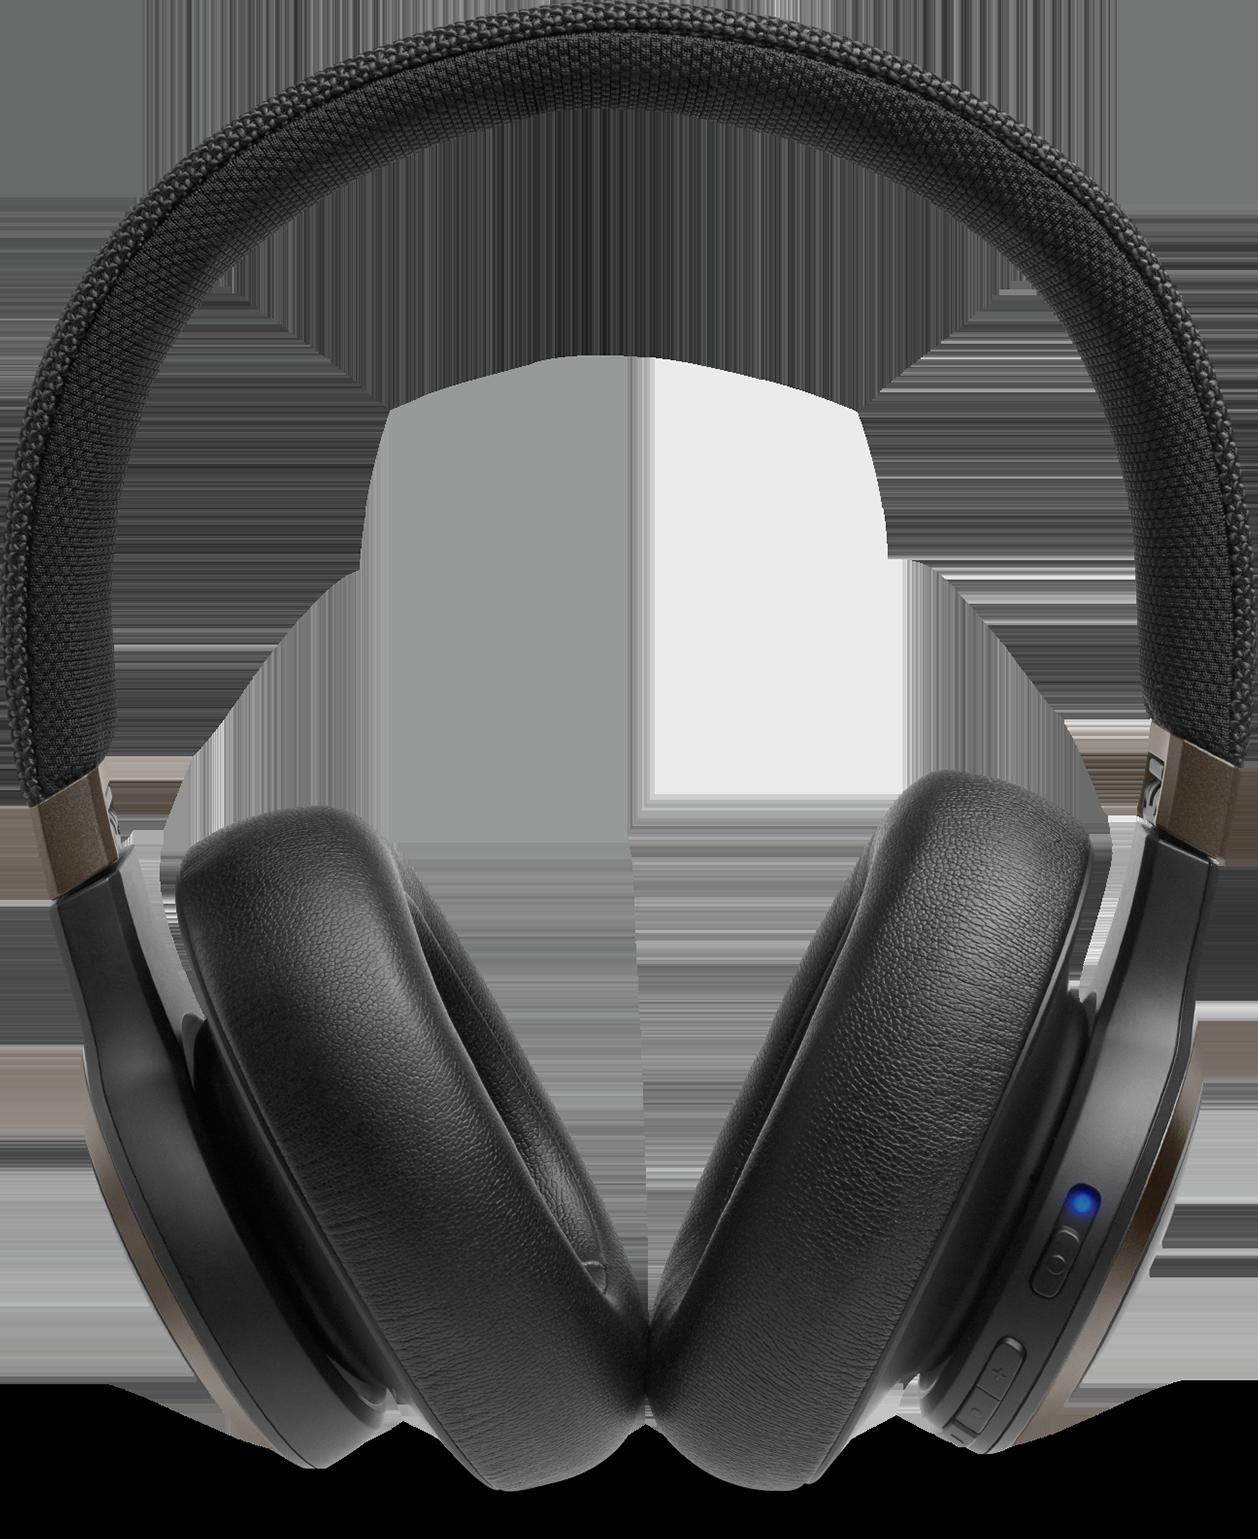 RE3HBe6?ver=8055 - JBL Live 650 BT Headphones